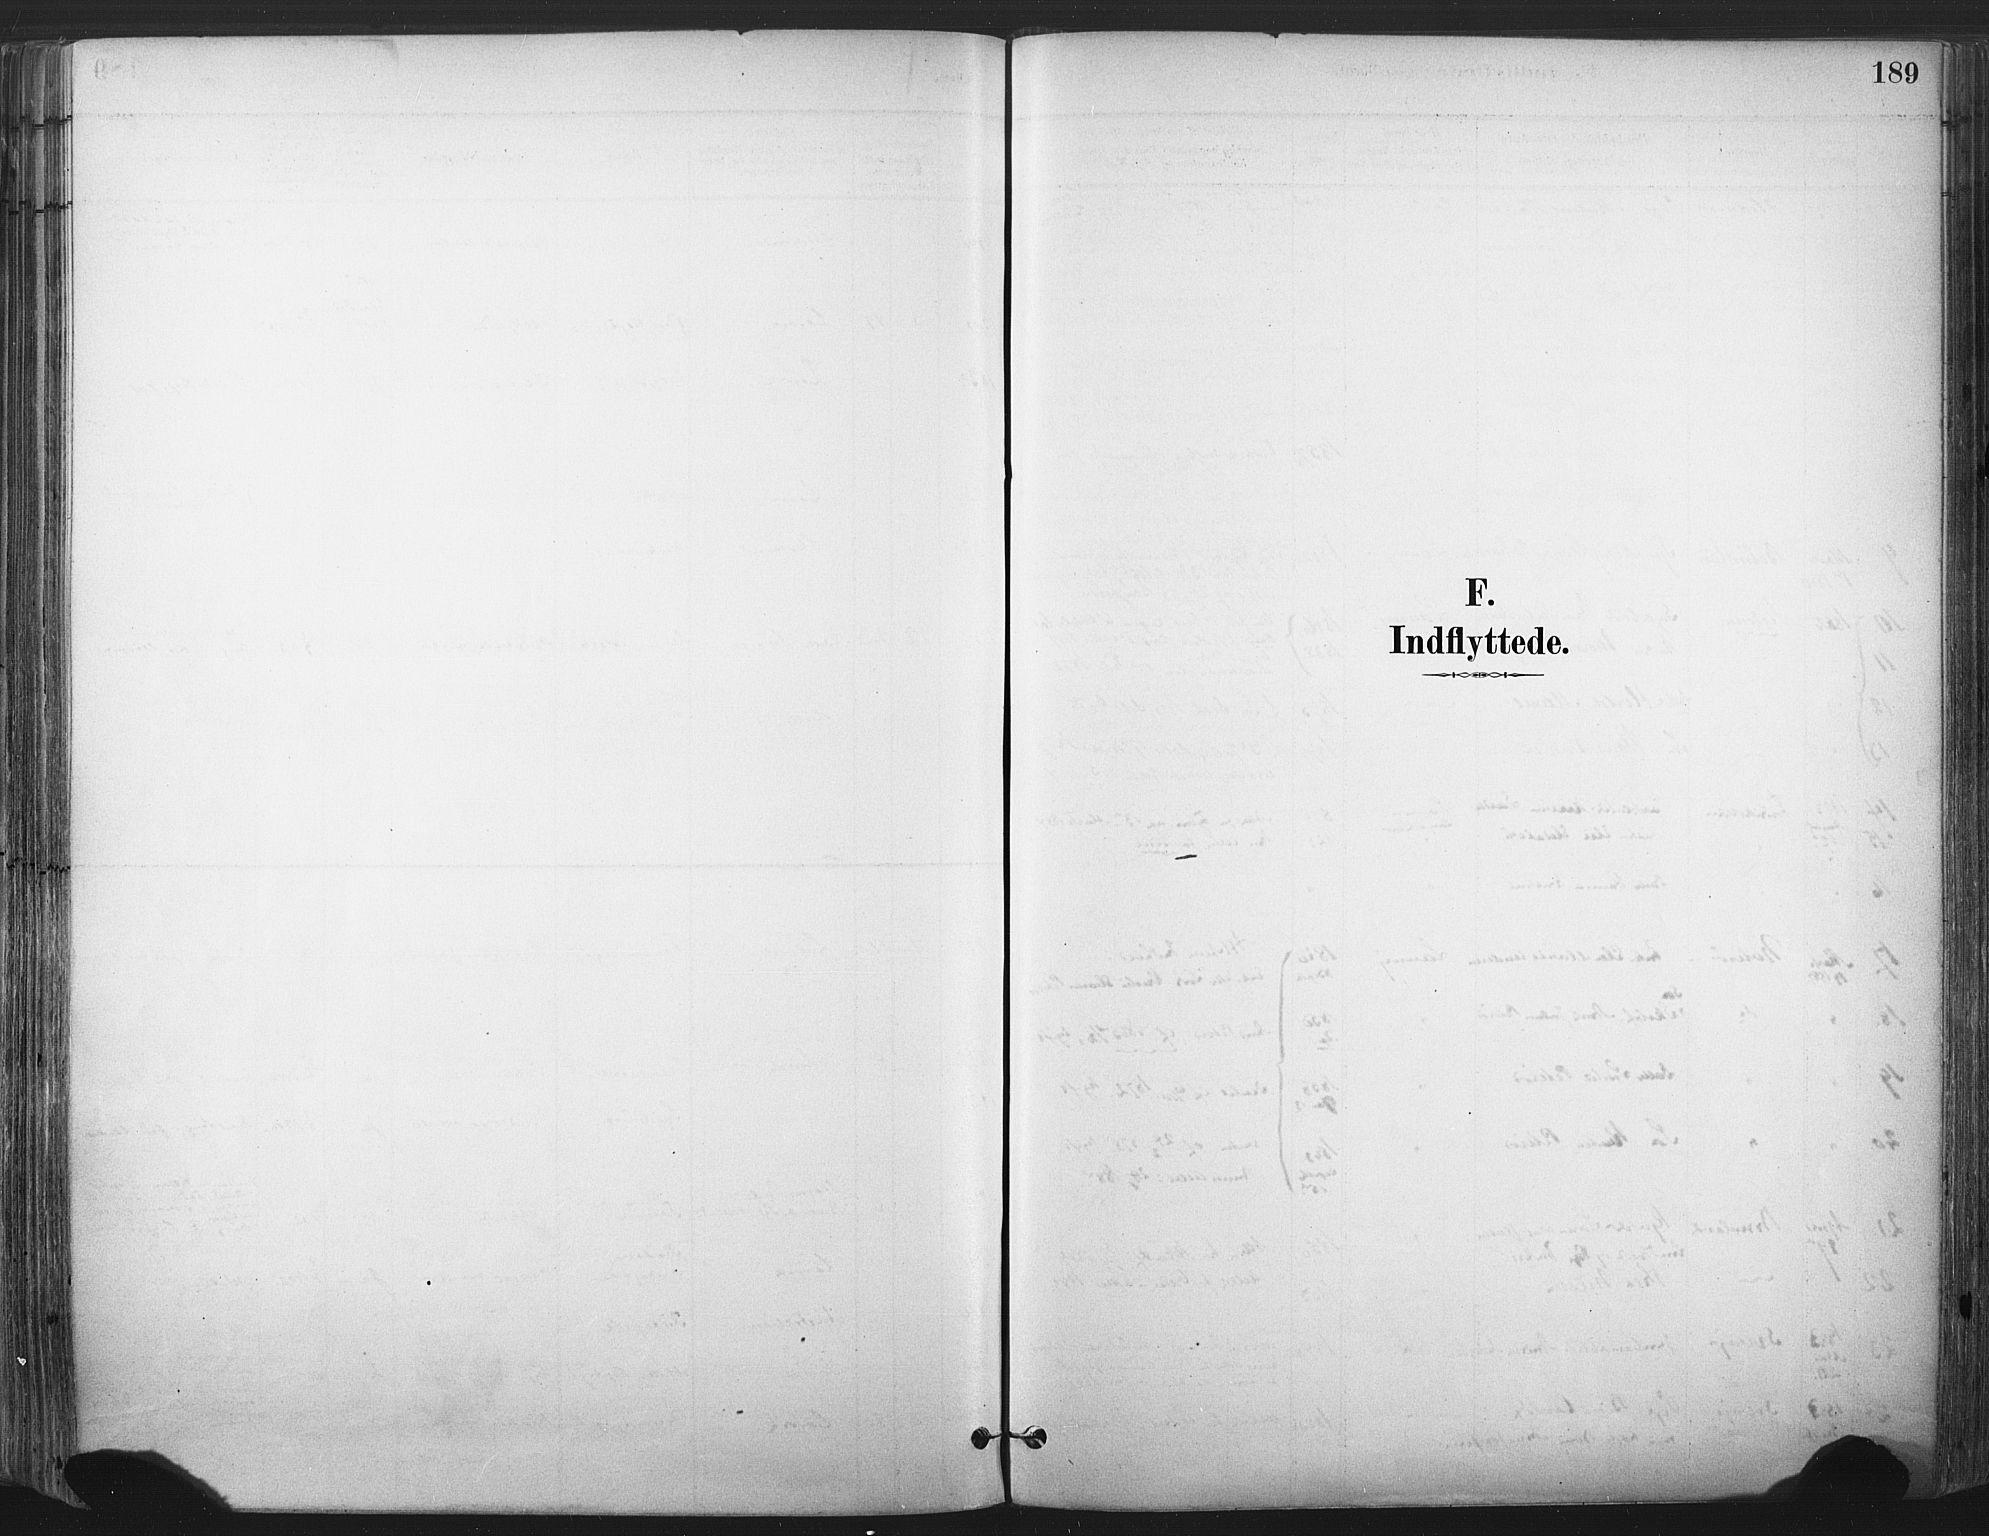 SAKO, Larvik kirkebøker, F/Fa/L0010: Ministerialbok nr. I 10, 1884-1910, s. 189